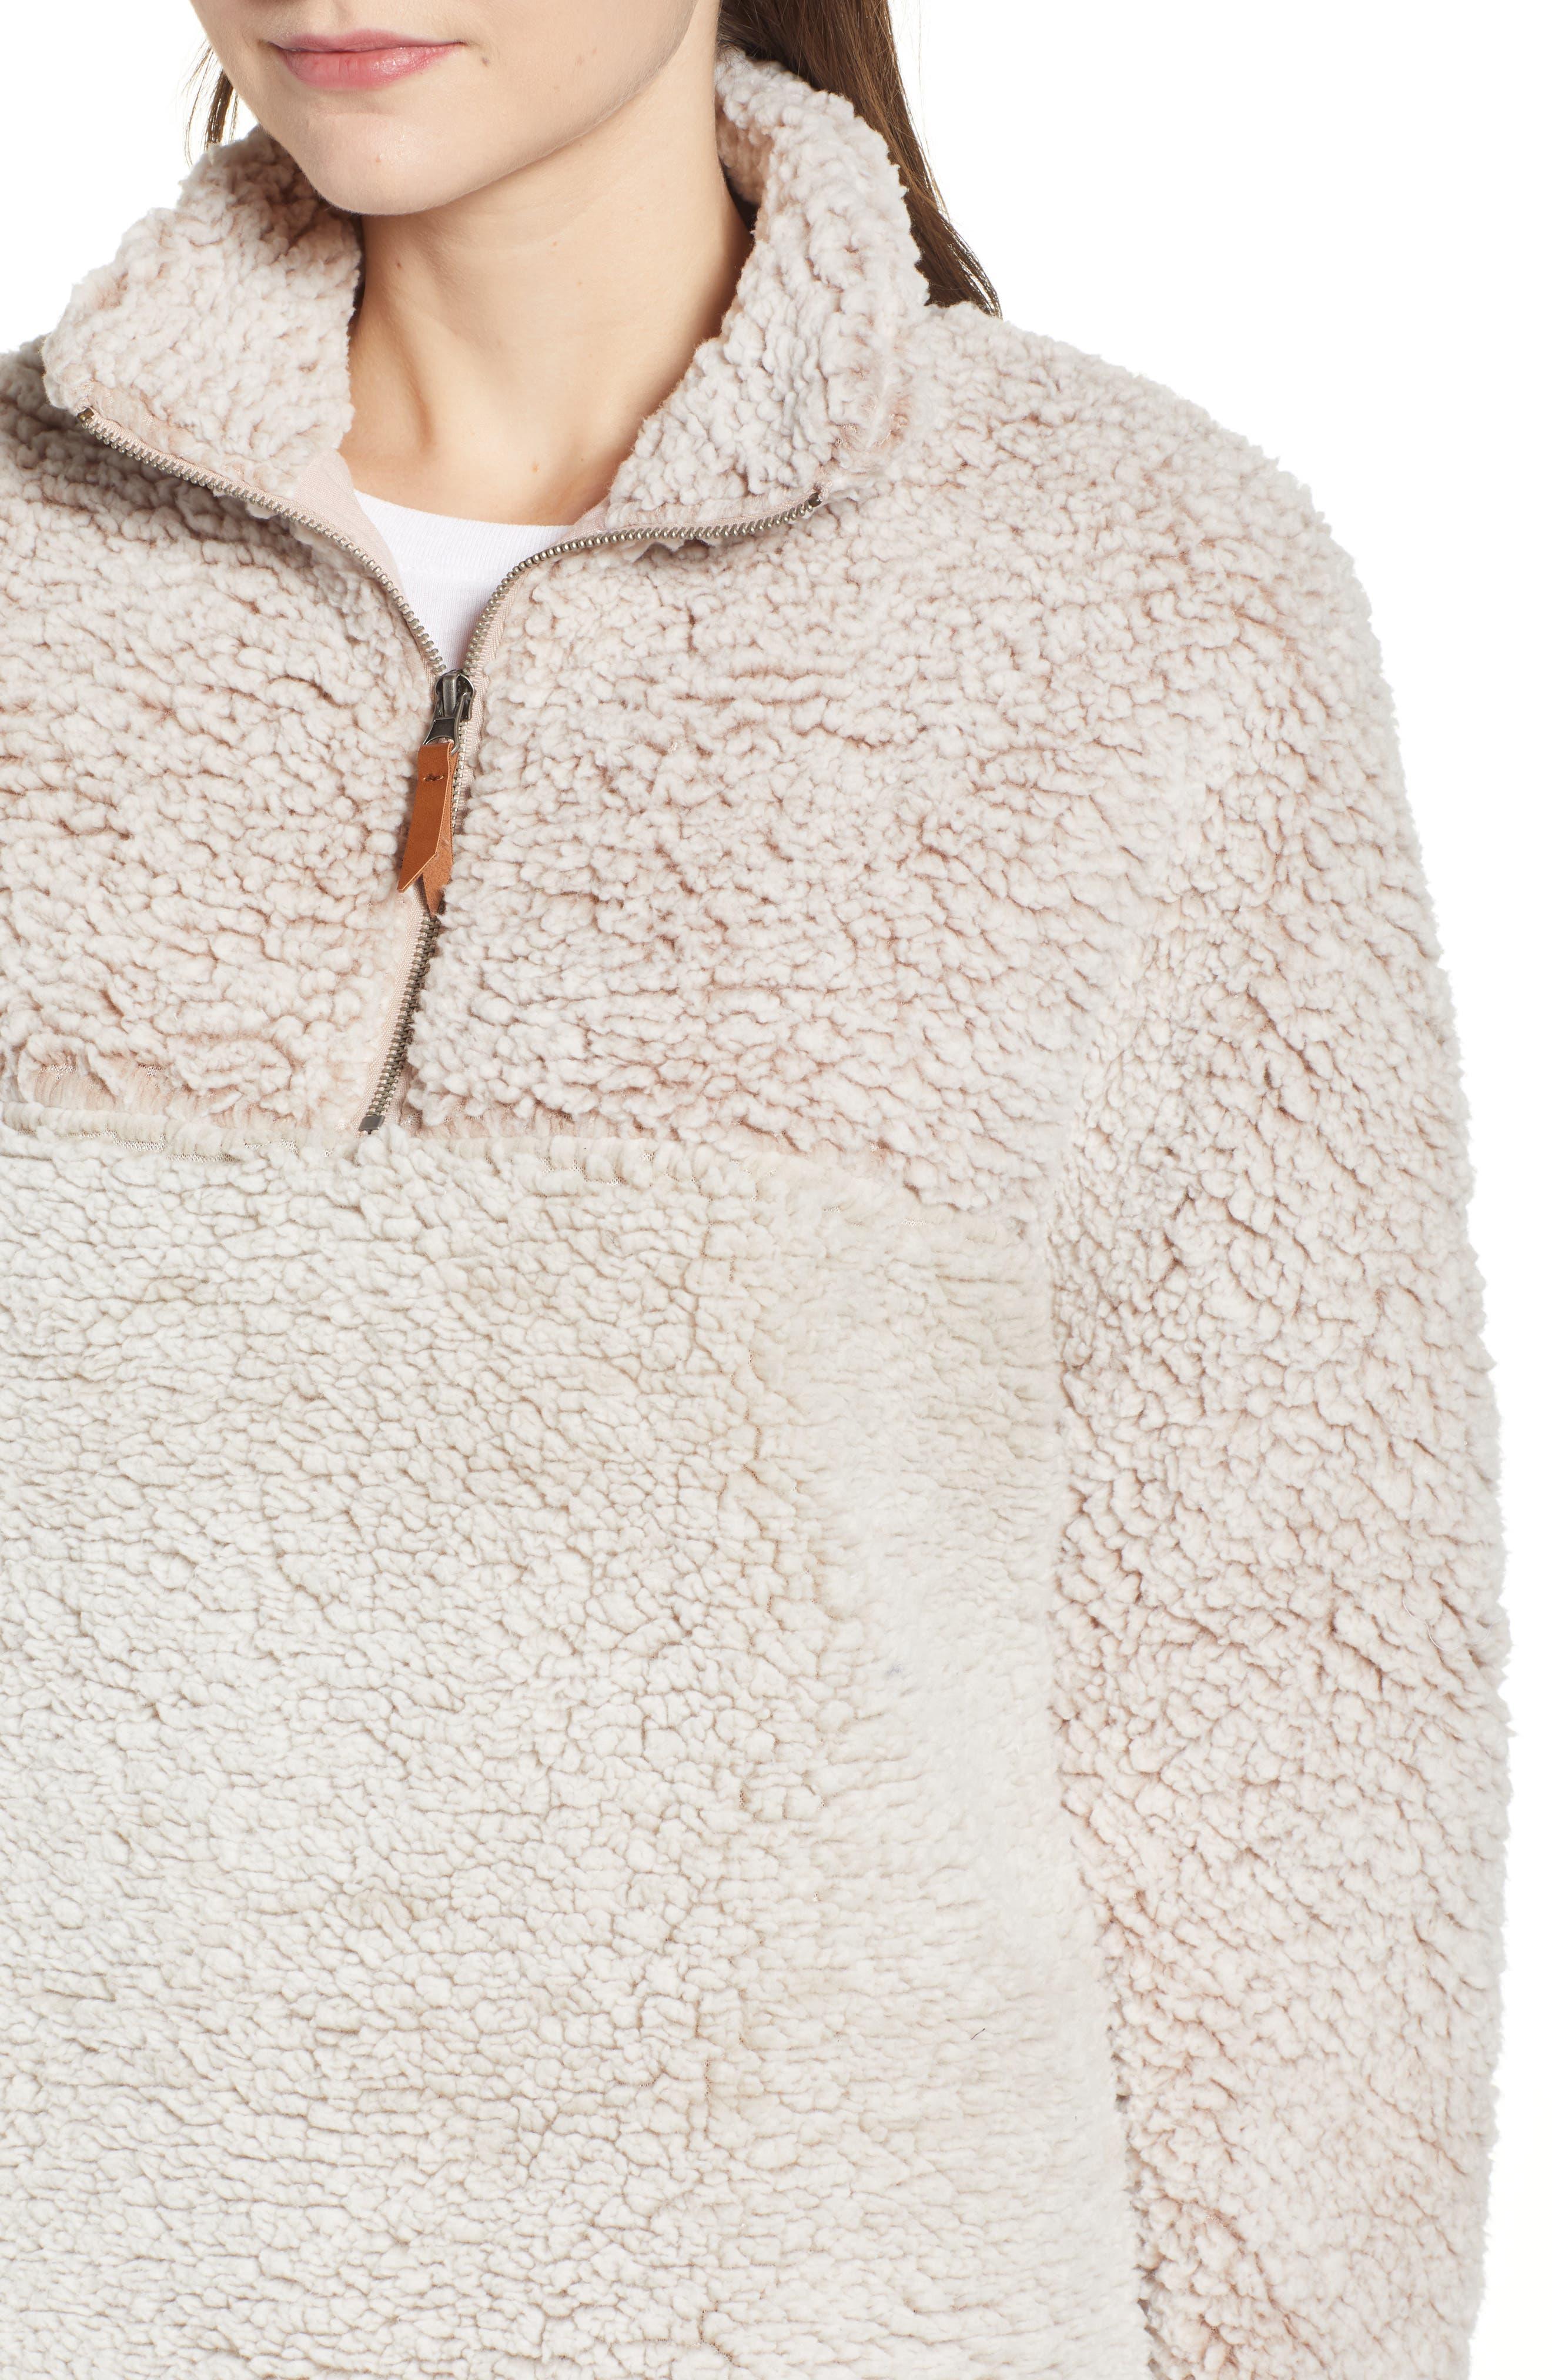 THREAD & SUPPLY, Colorblock Wubby Fleece Pullover, Alternate thumbnail 4, color, SMOKE ROSE IVORY